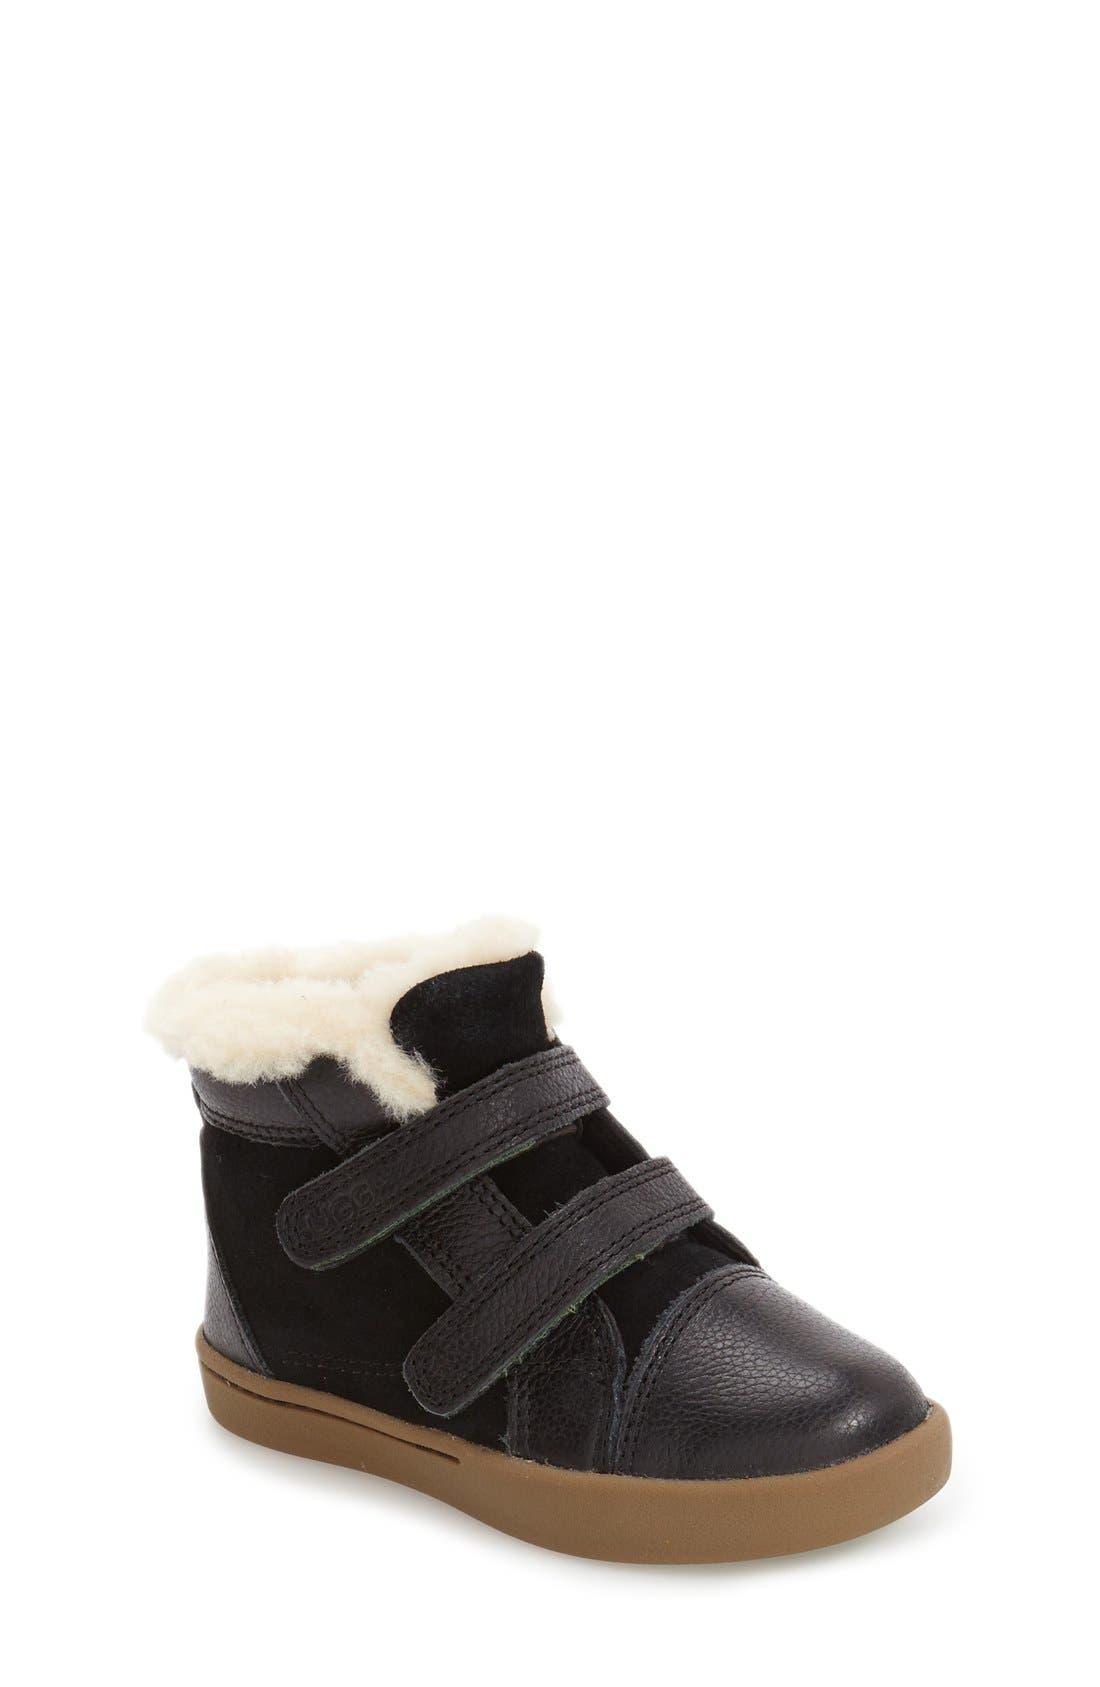 Rennon High Top Sneaker,                             Main thumbnail 1, color,                             001